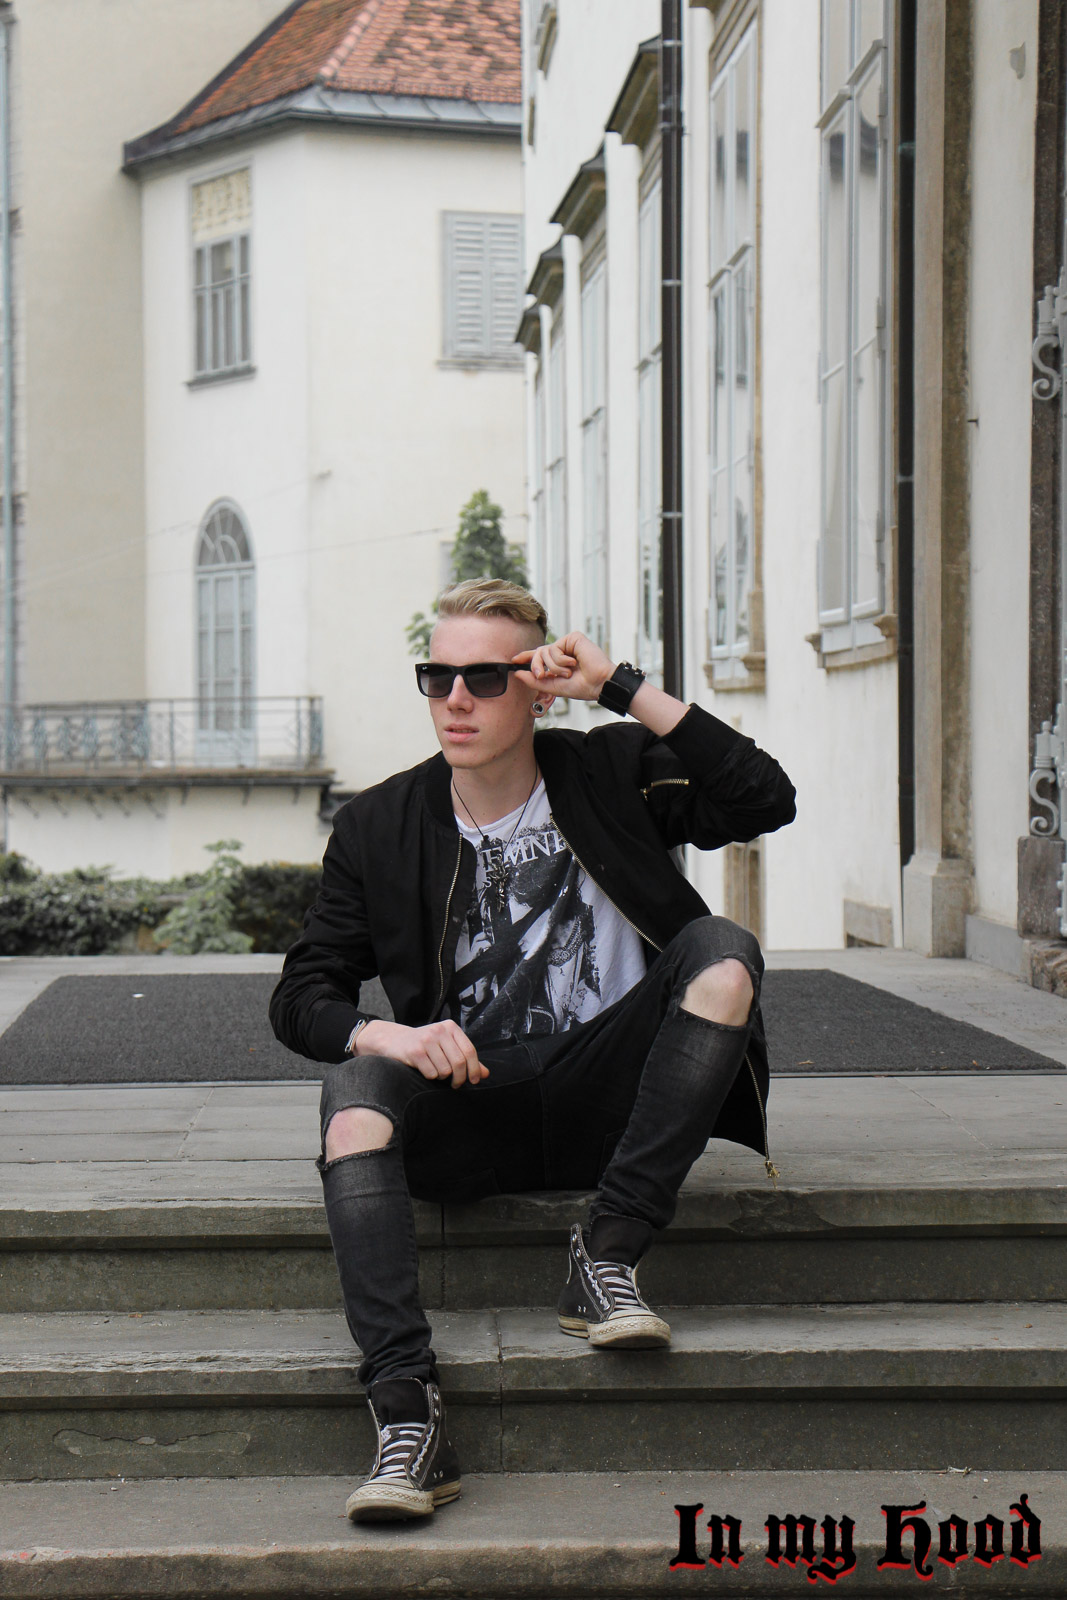 MY STYLE Bomberjacke und Knee-Cut Jeans, In my Hood, Tobias, Austria, Steiermark, Graz, Grazer Blogger, OOTD, WIW, What I wore, Instastyle, Style is what , Streetstyle, Fashionaddict, Mensfashion, Mensstyle, Men with style, Fashiongoals, Fashionkilla, styled, Styleguide, Fashionblogger, Styleblogger, Lifestyleblog, Lifestyleblogger, Bloggerstyle, Bomberjacke, Converse, Knee-Cut Jeans, Ray Ban